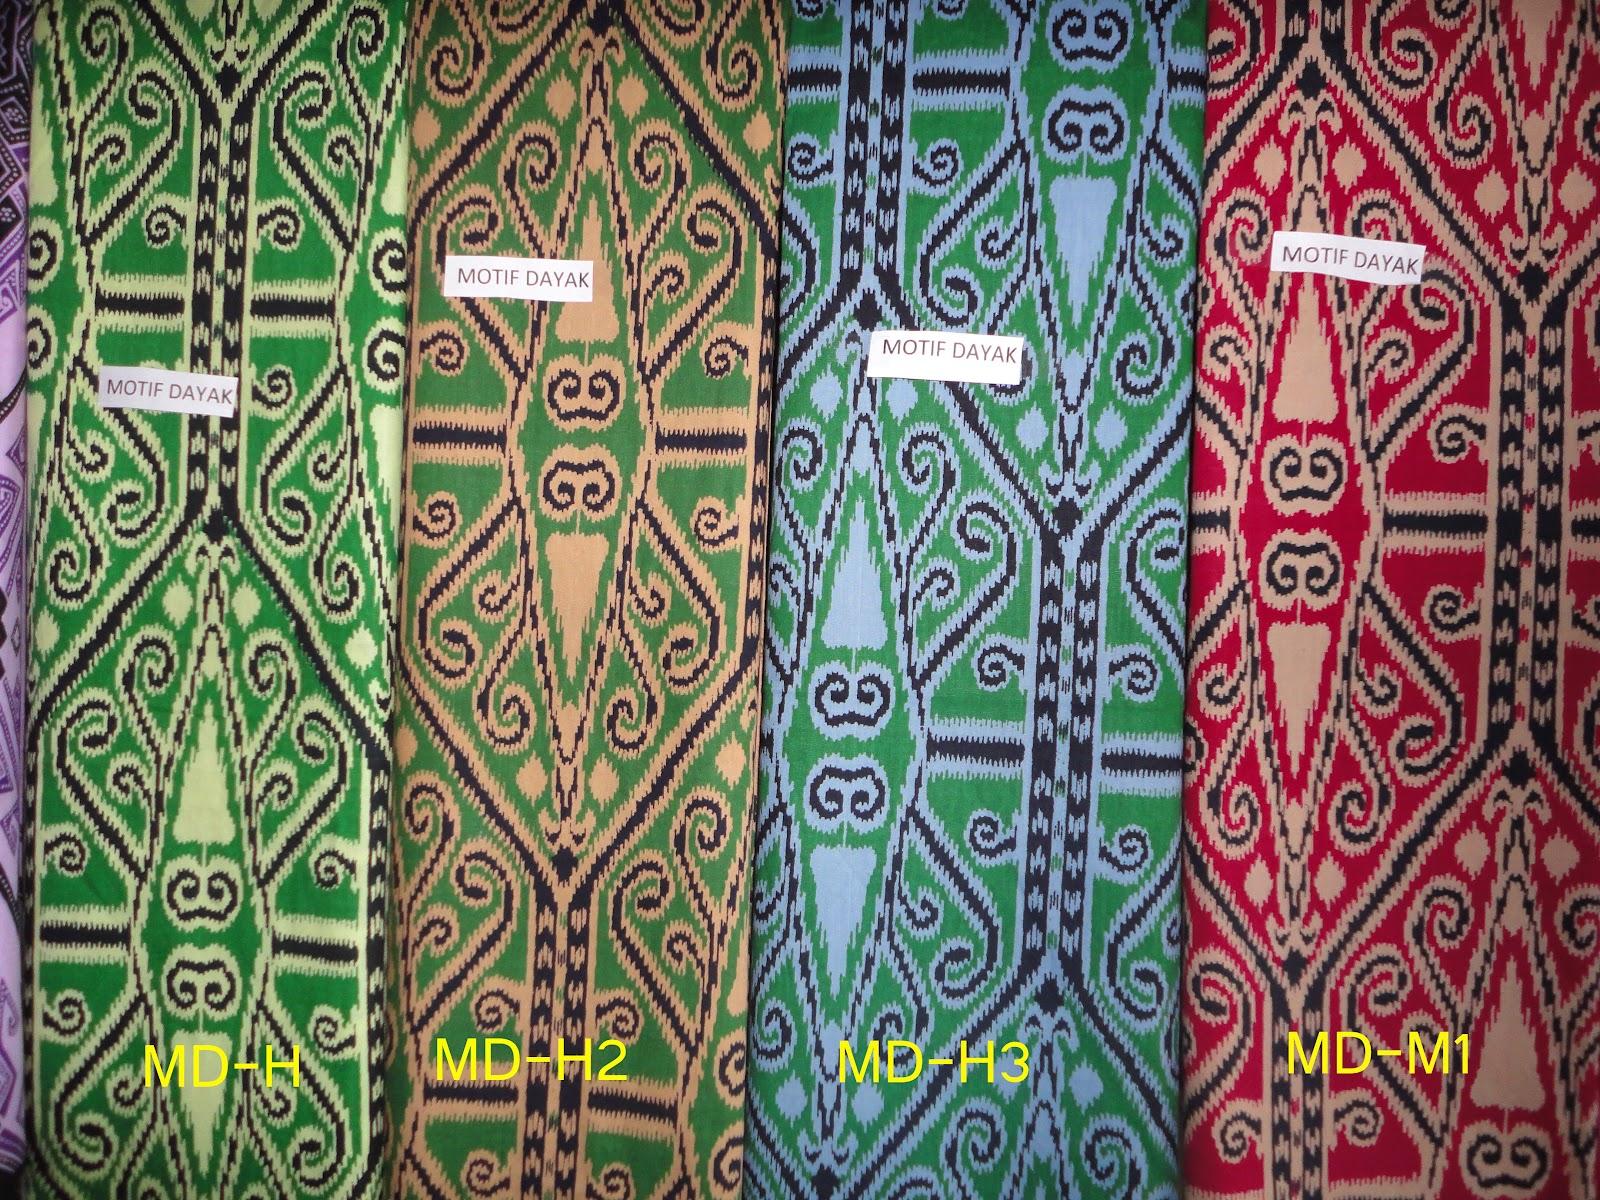 Batik Motif Dayak Khas Kalimantan  BATIK MOTIF DAYAK BAHAN KATUN